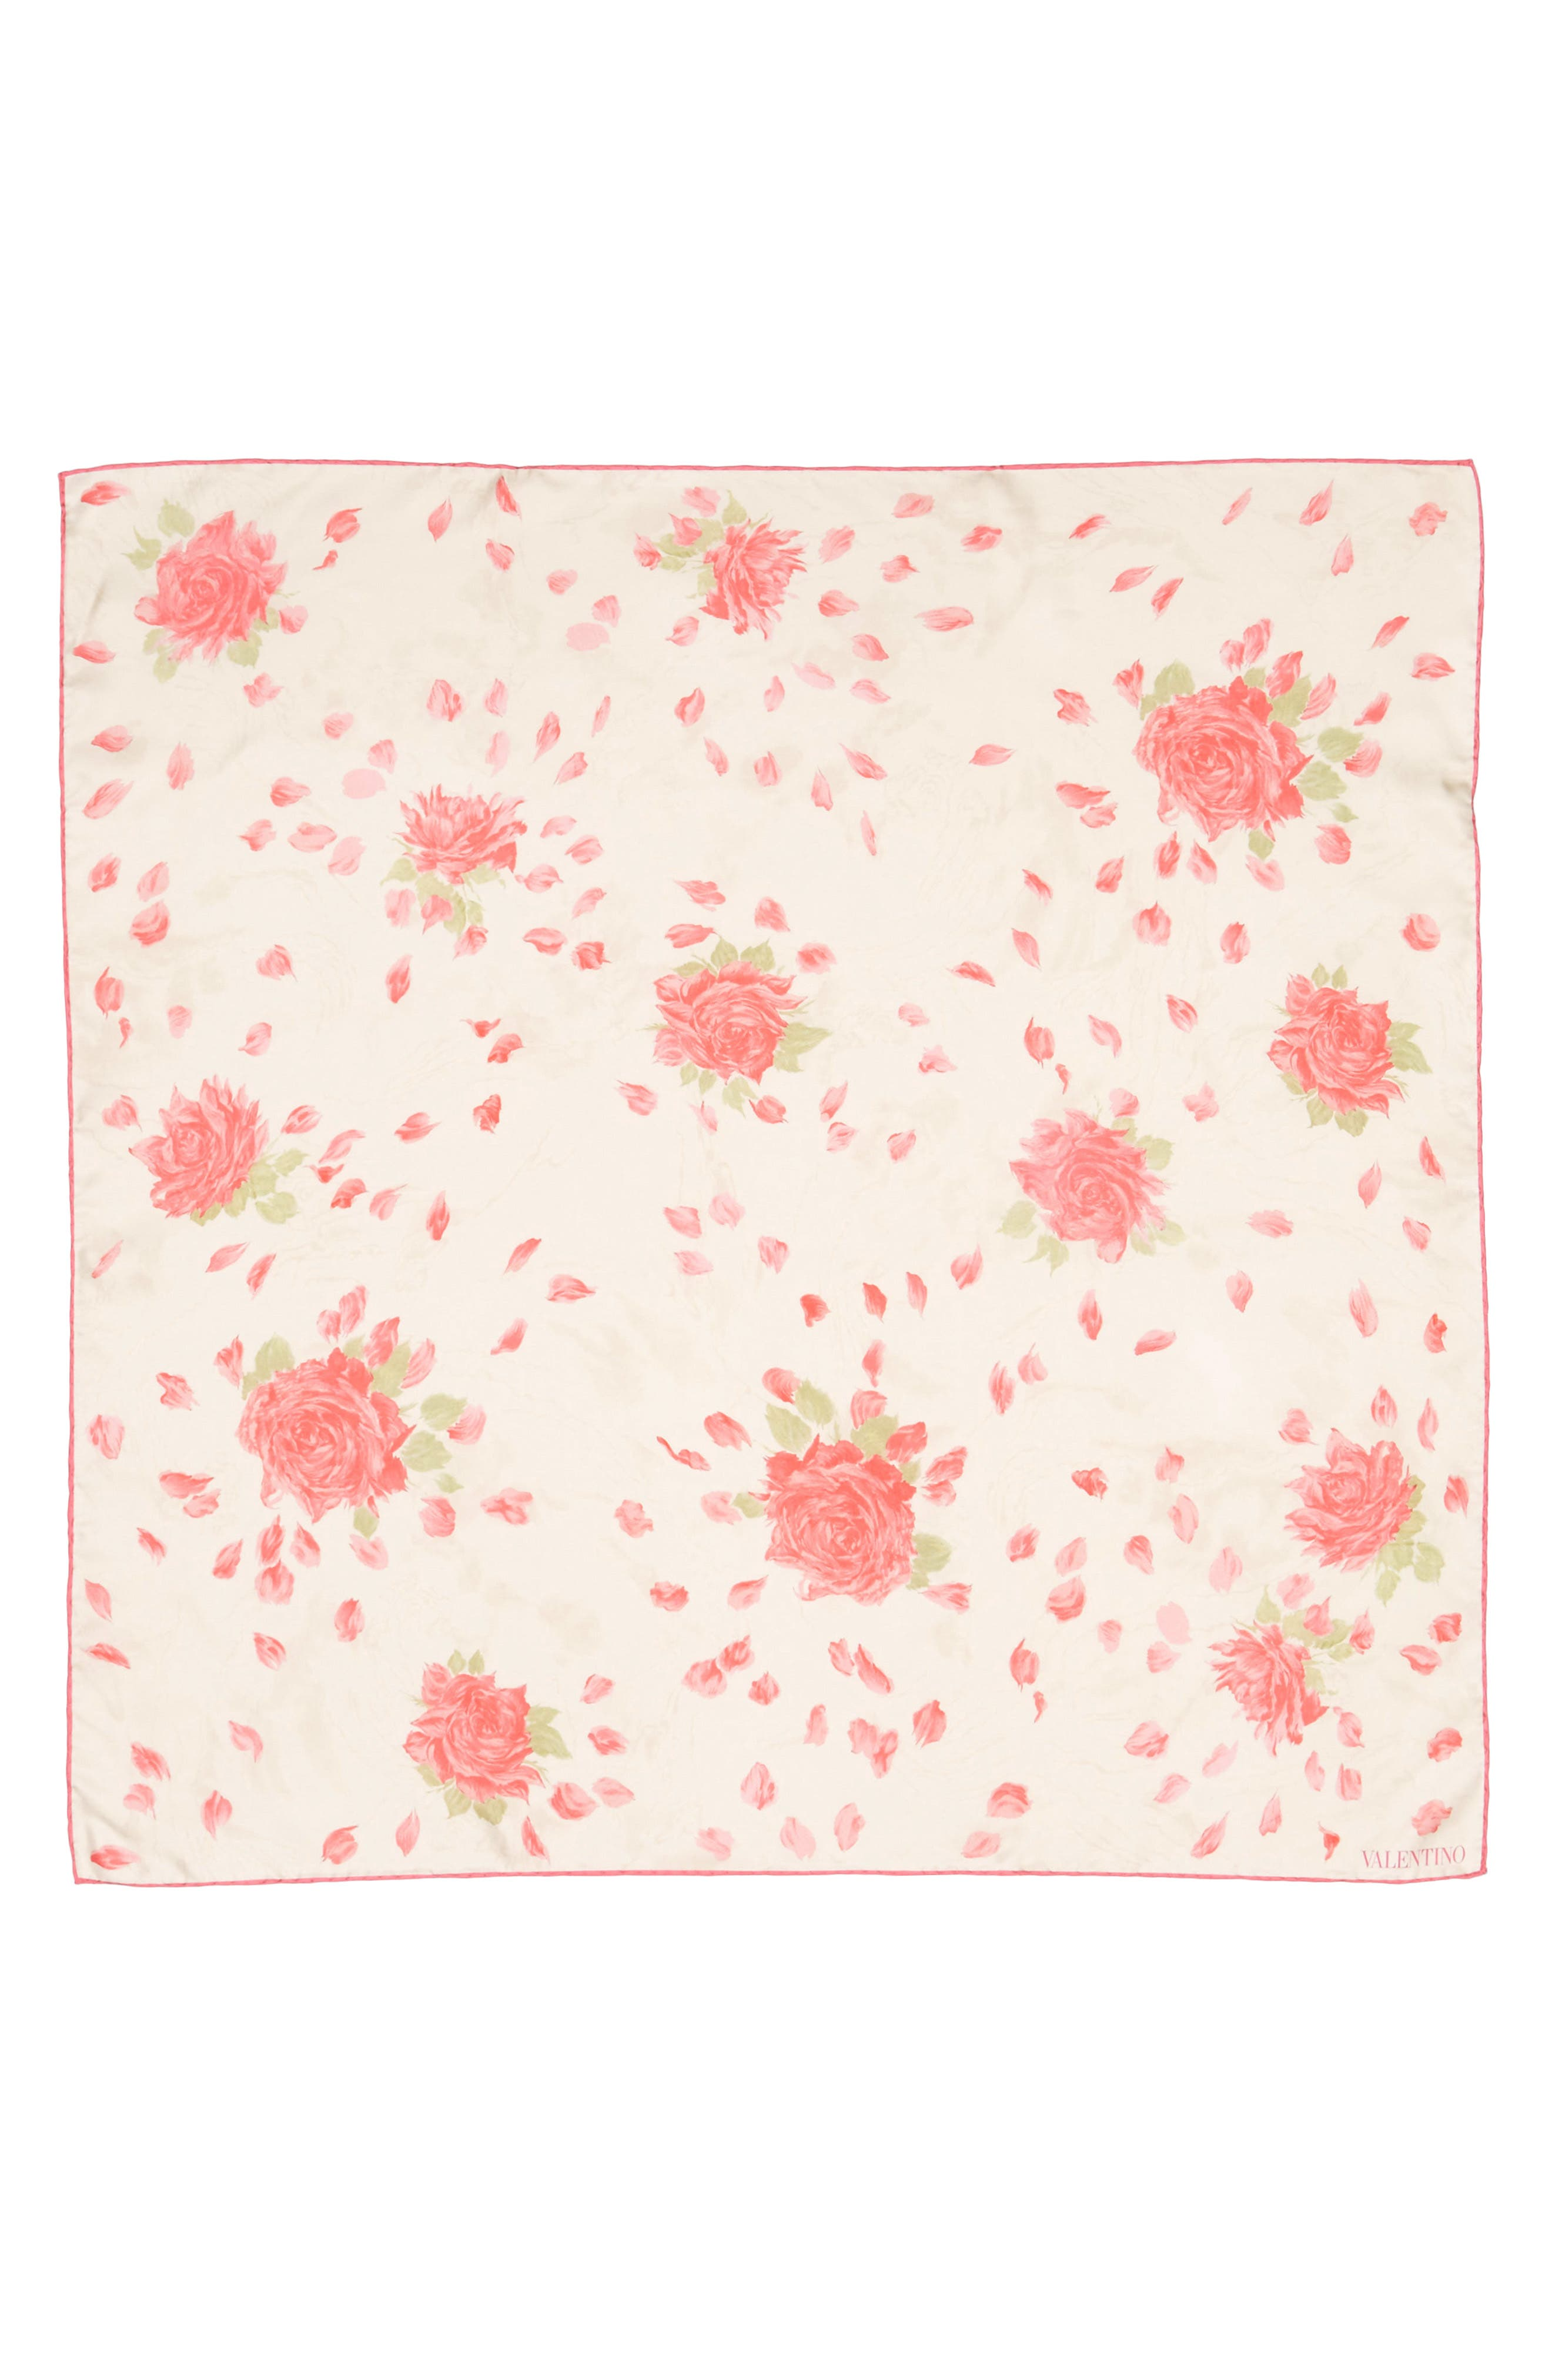 GARAVANI Rose Re-Edition Square Silk Scarf,                             Main thumbnail 1, color,                             650